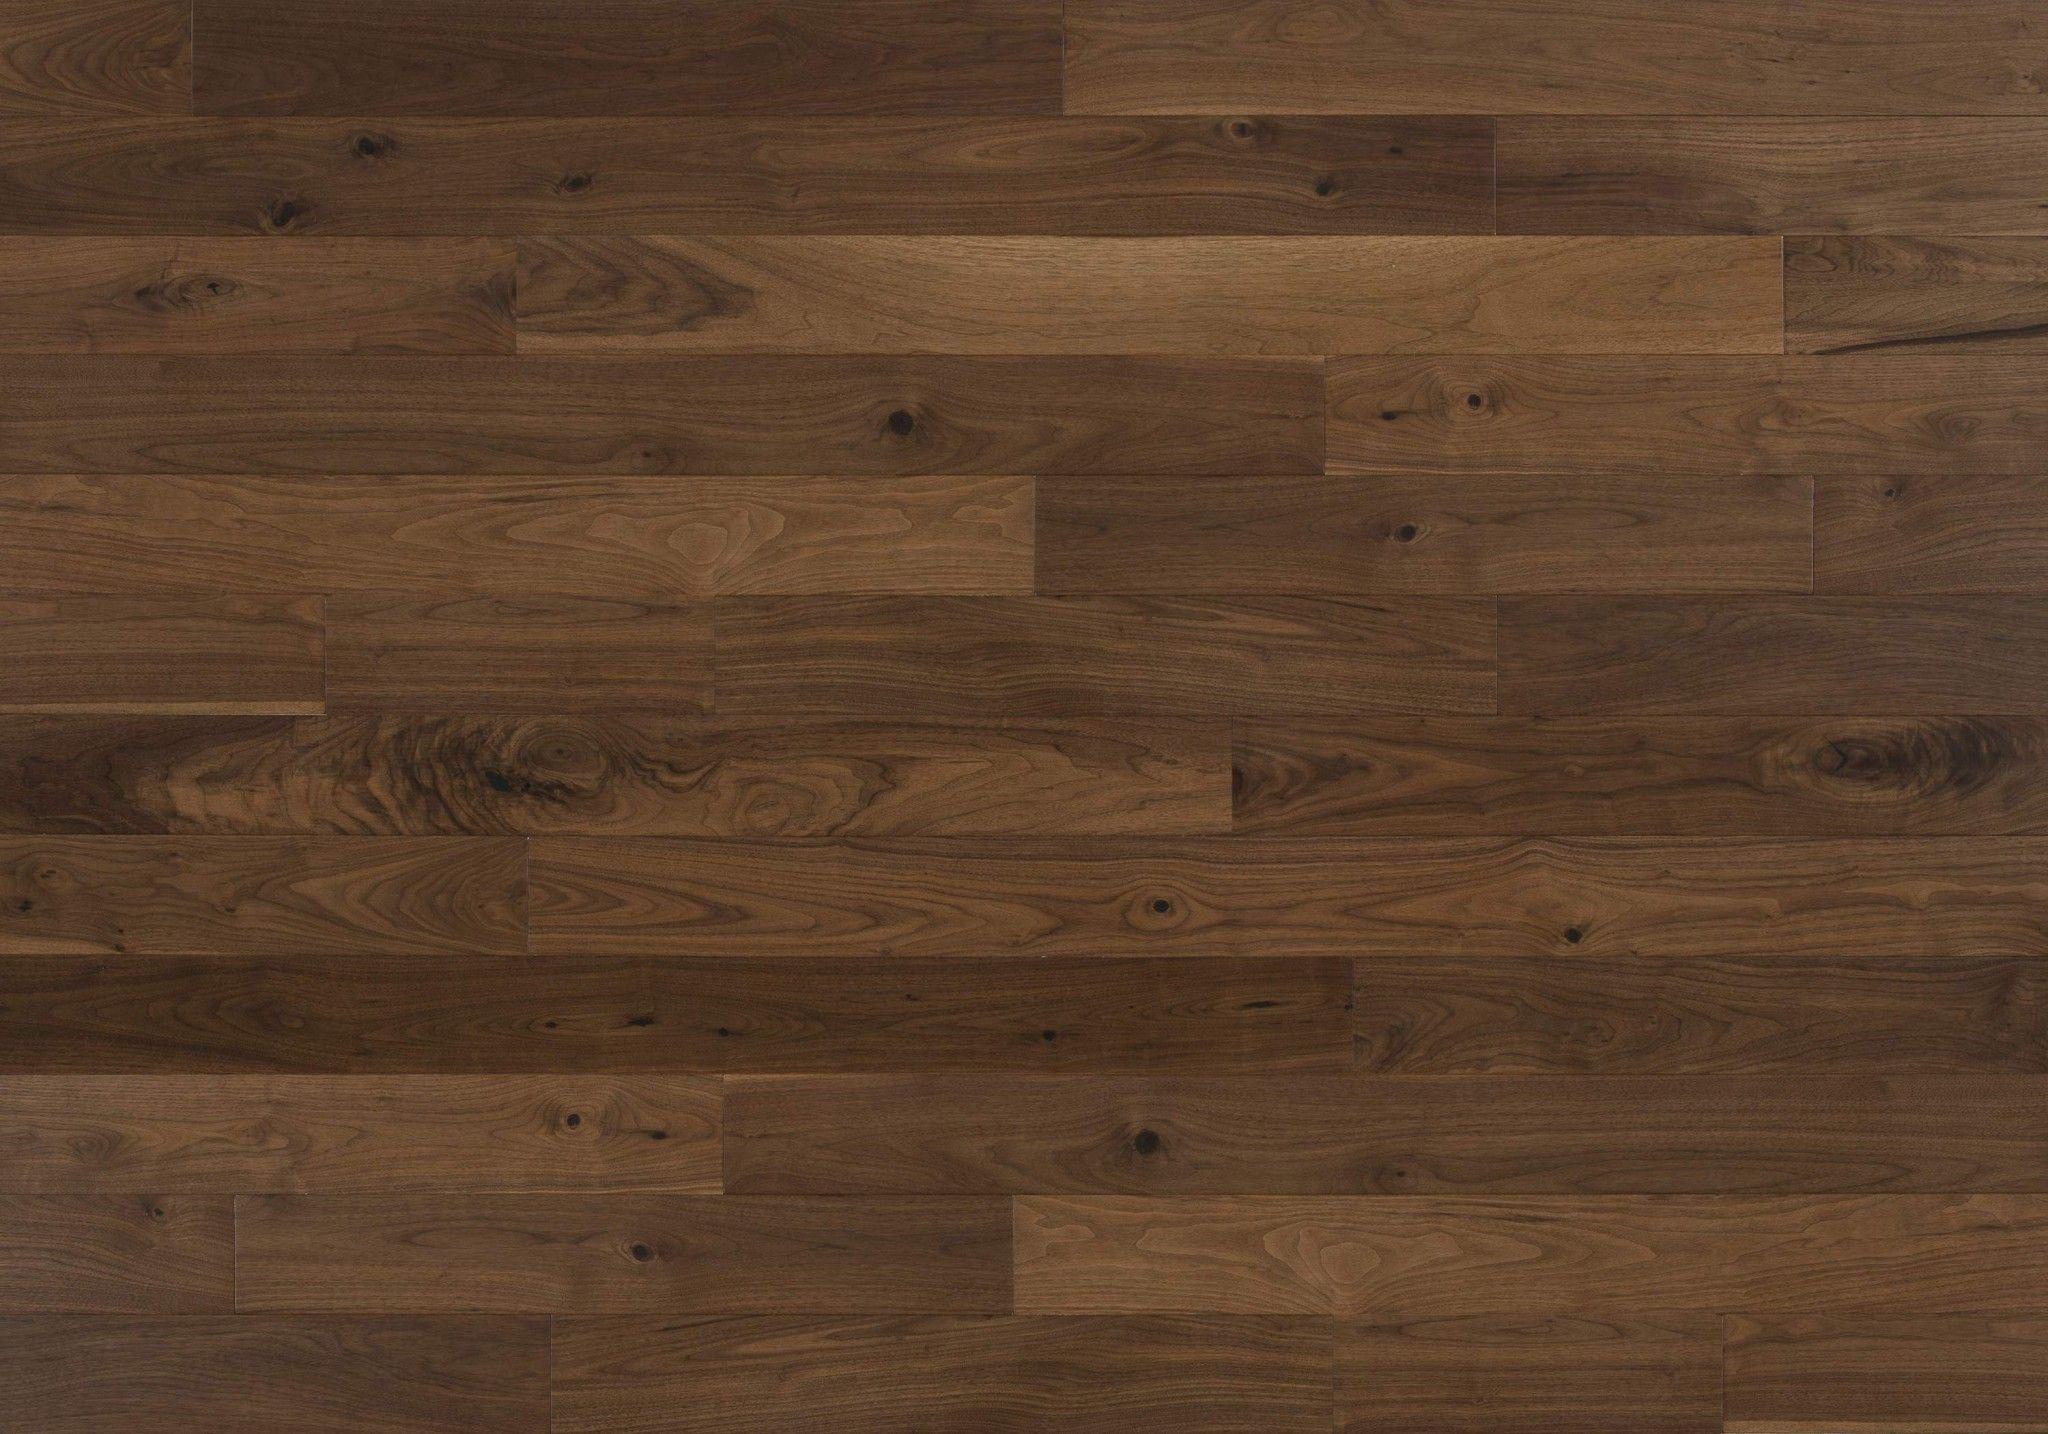 Black Walnut Hardwood Flooring Brown Countryside Homestead